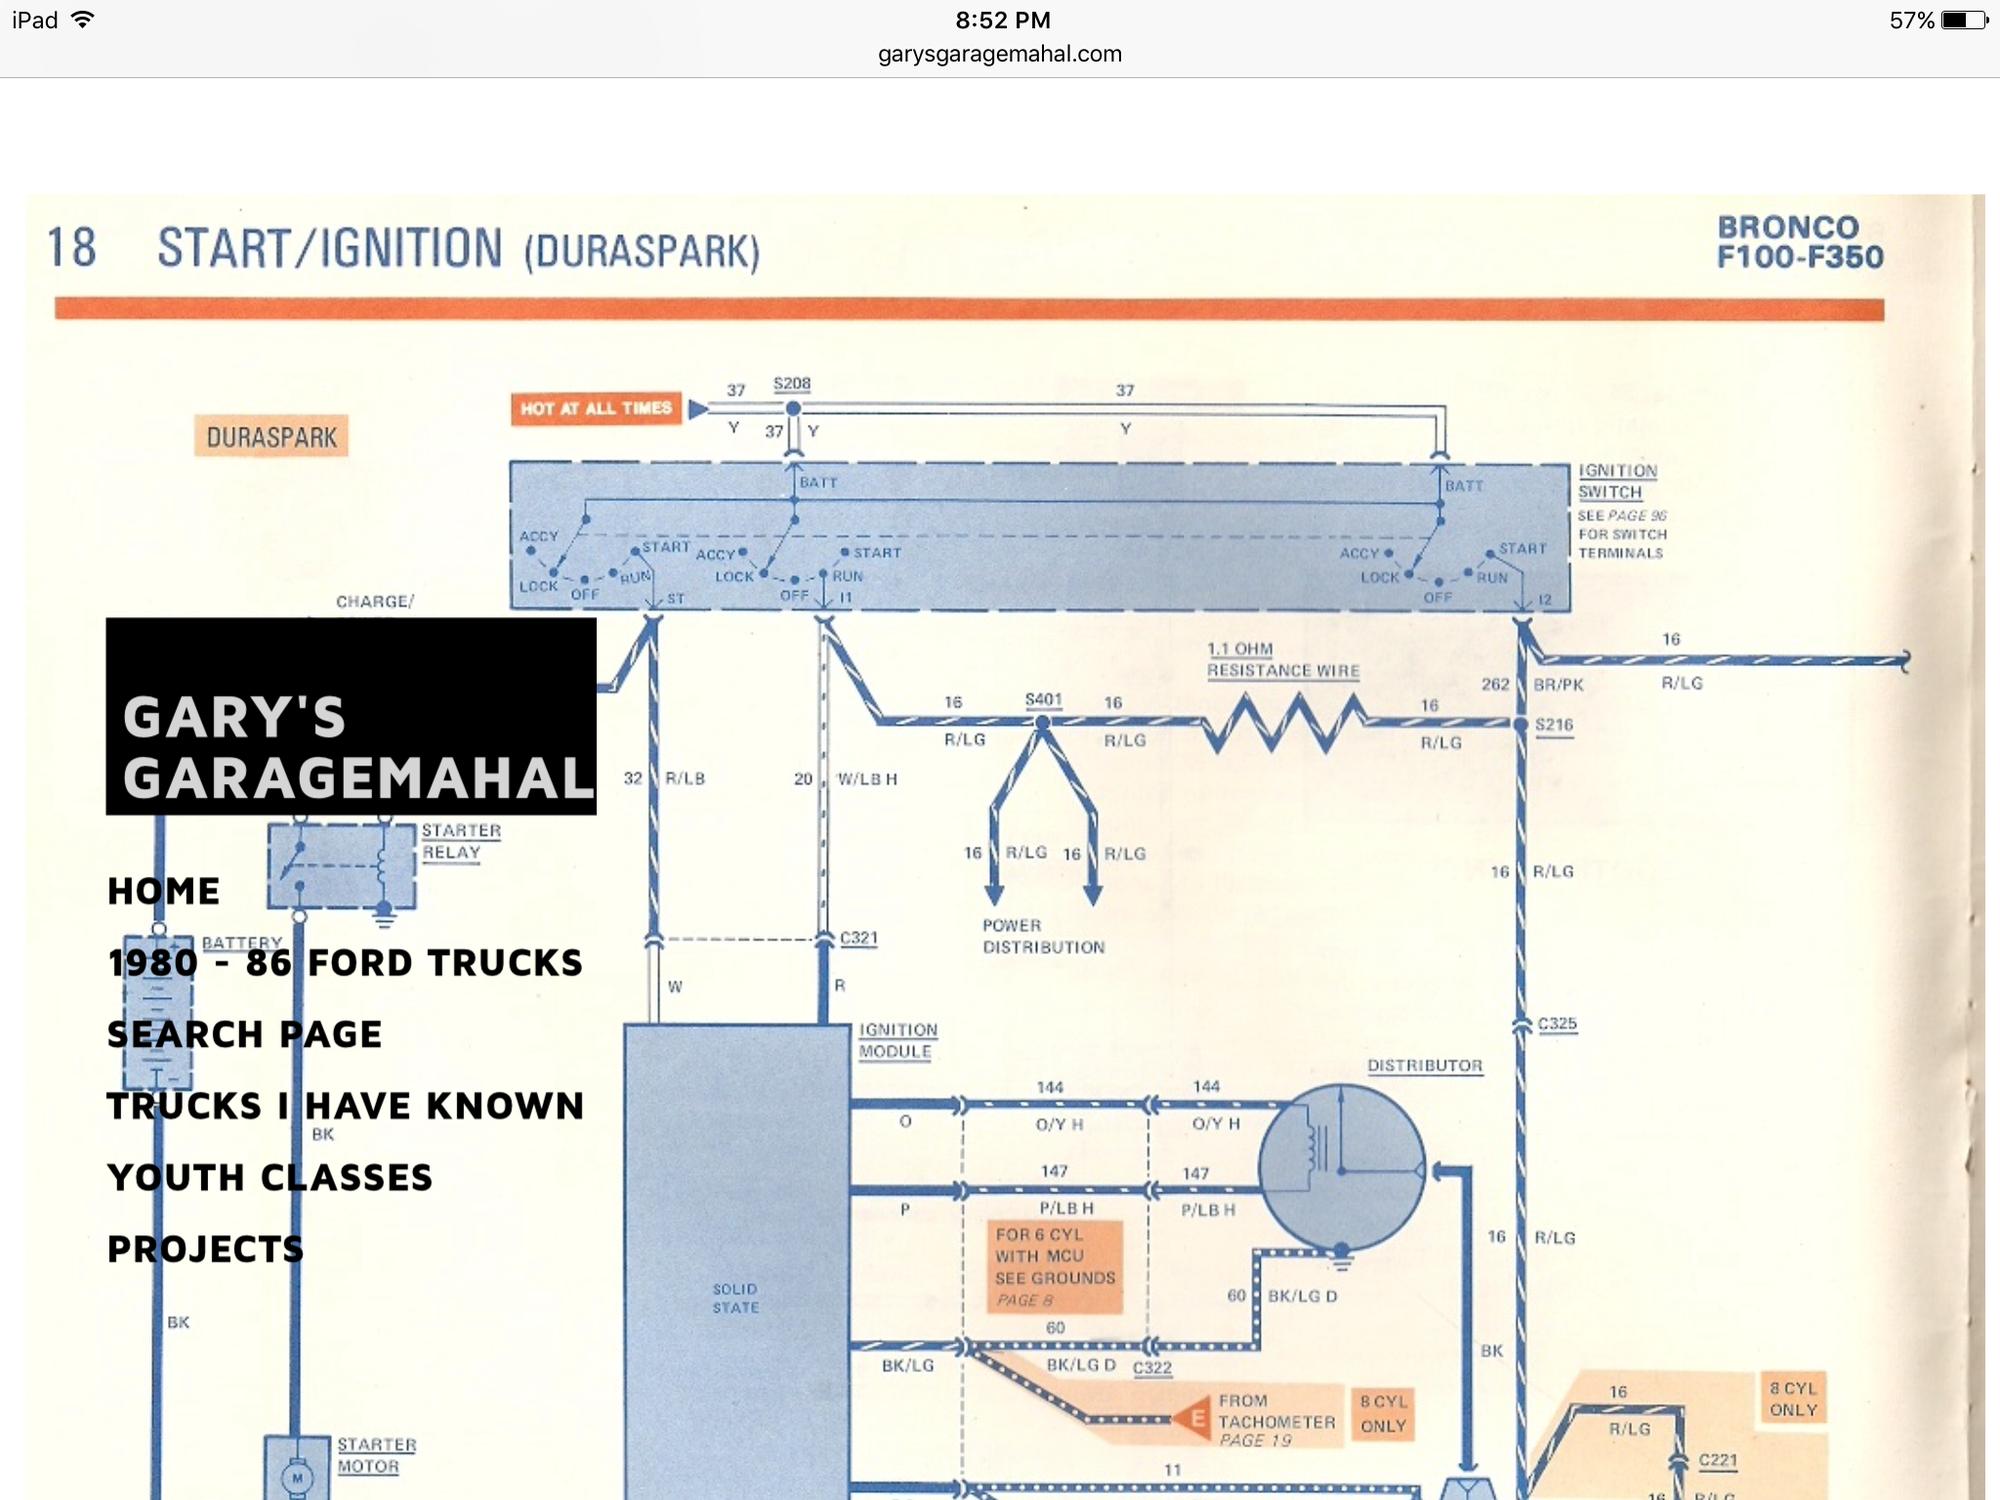 1975 Yamaha Dt 125 Wiring Diagram : Yamaha dt wiring diagram parts